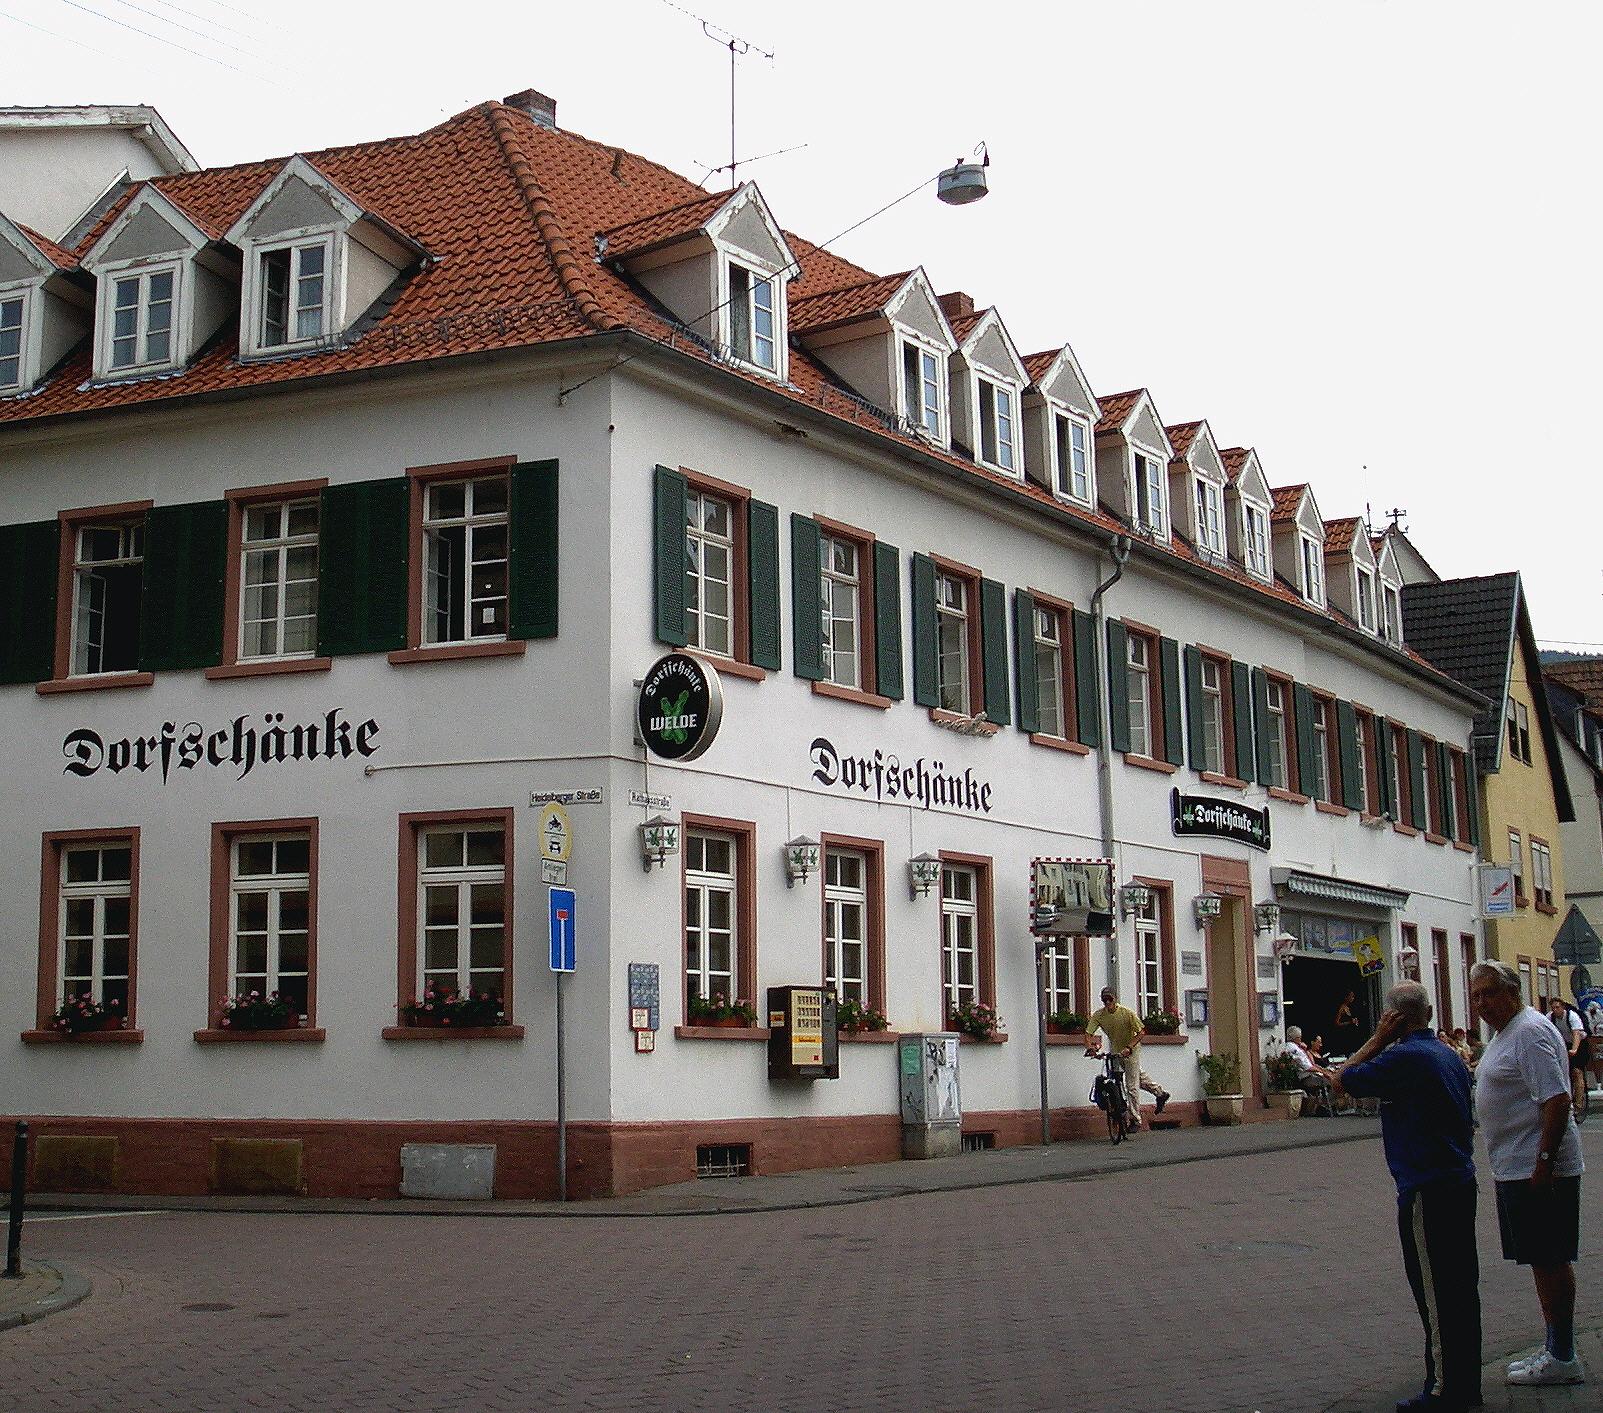 Datei:200607271519 HD-Rohrbach Dorfschänke.jpg – Wikipedia